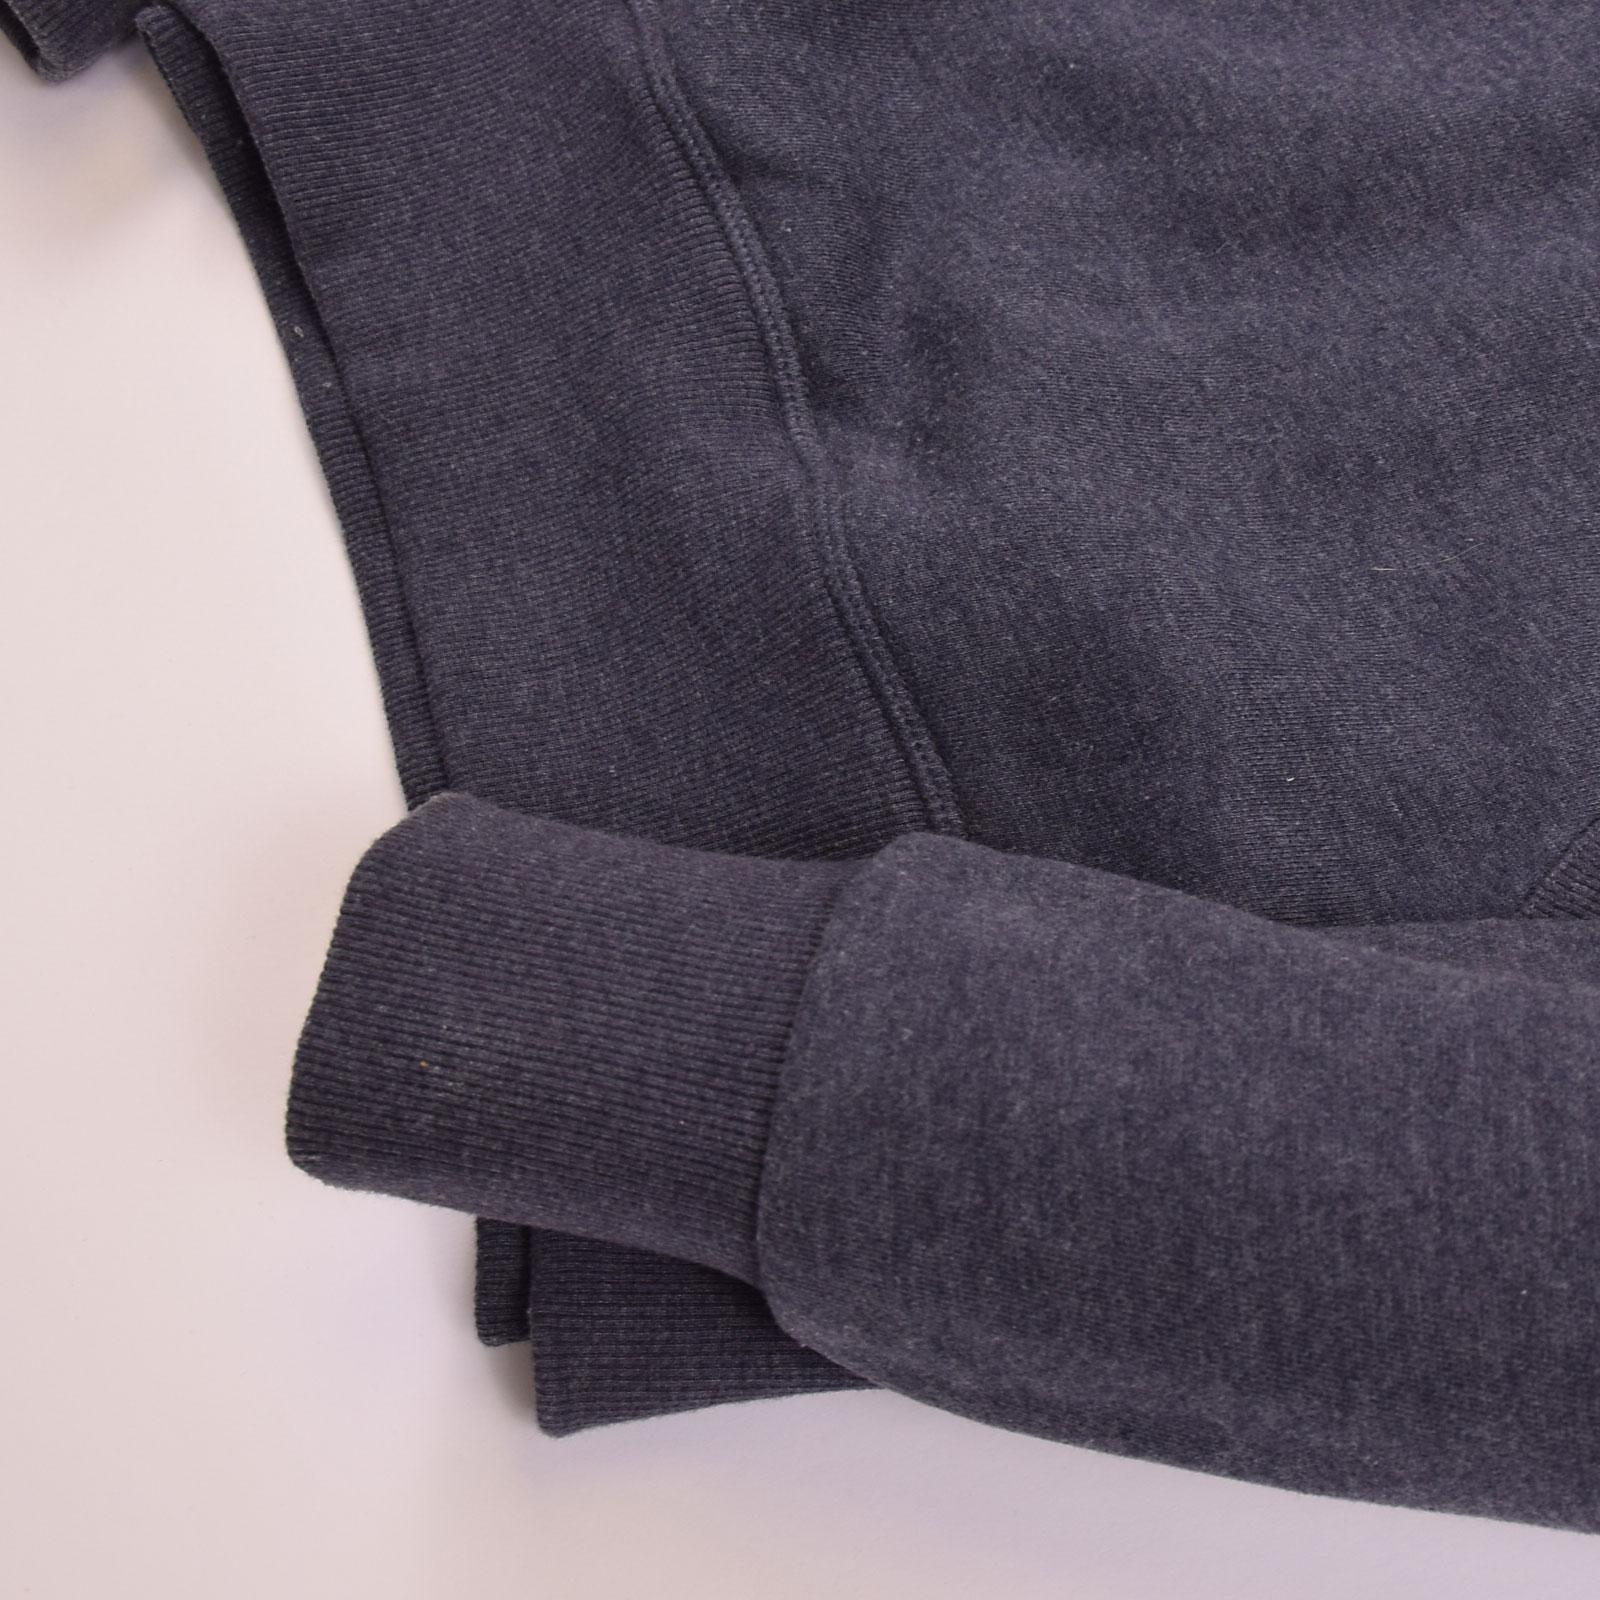 Details zu Superdry Herren Hoodie Kapuzenpullover Gr.S Vintage Sweater Blau 93860